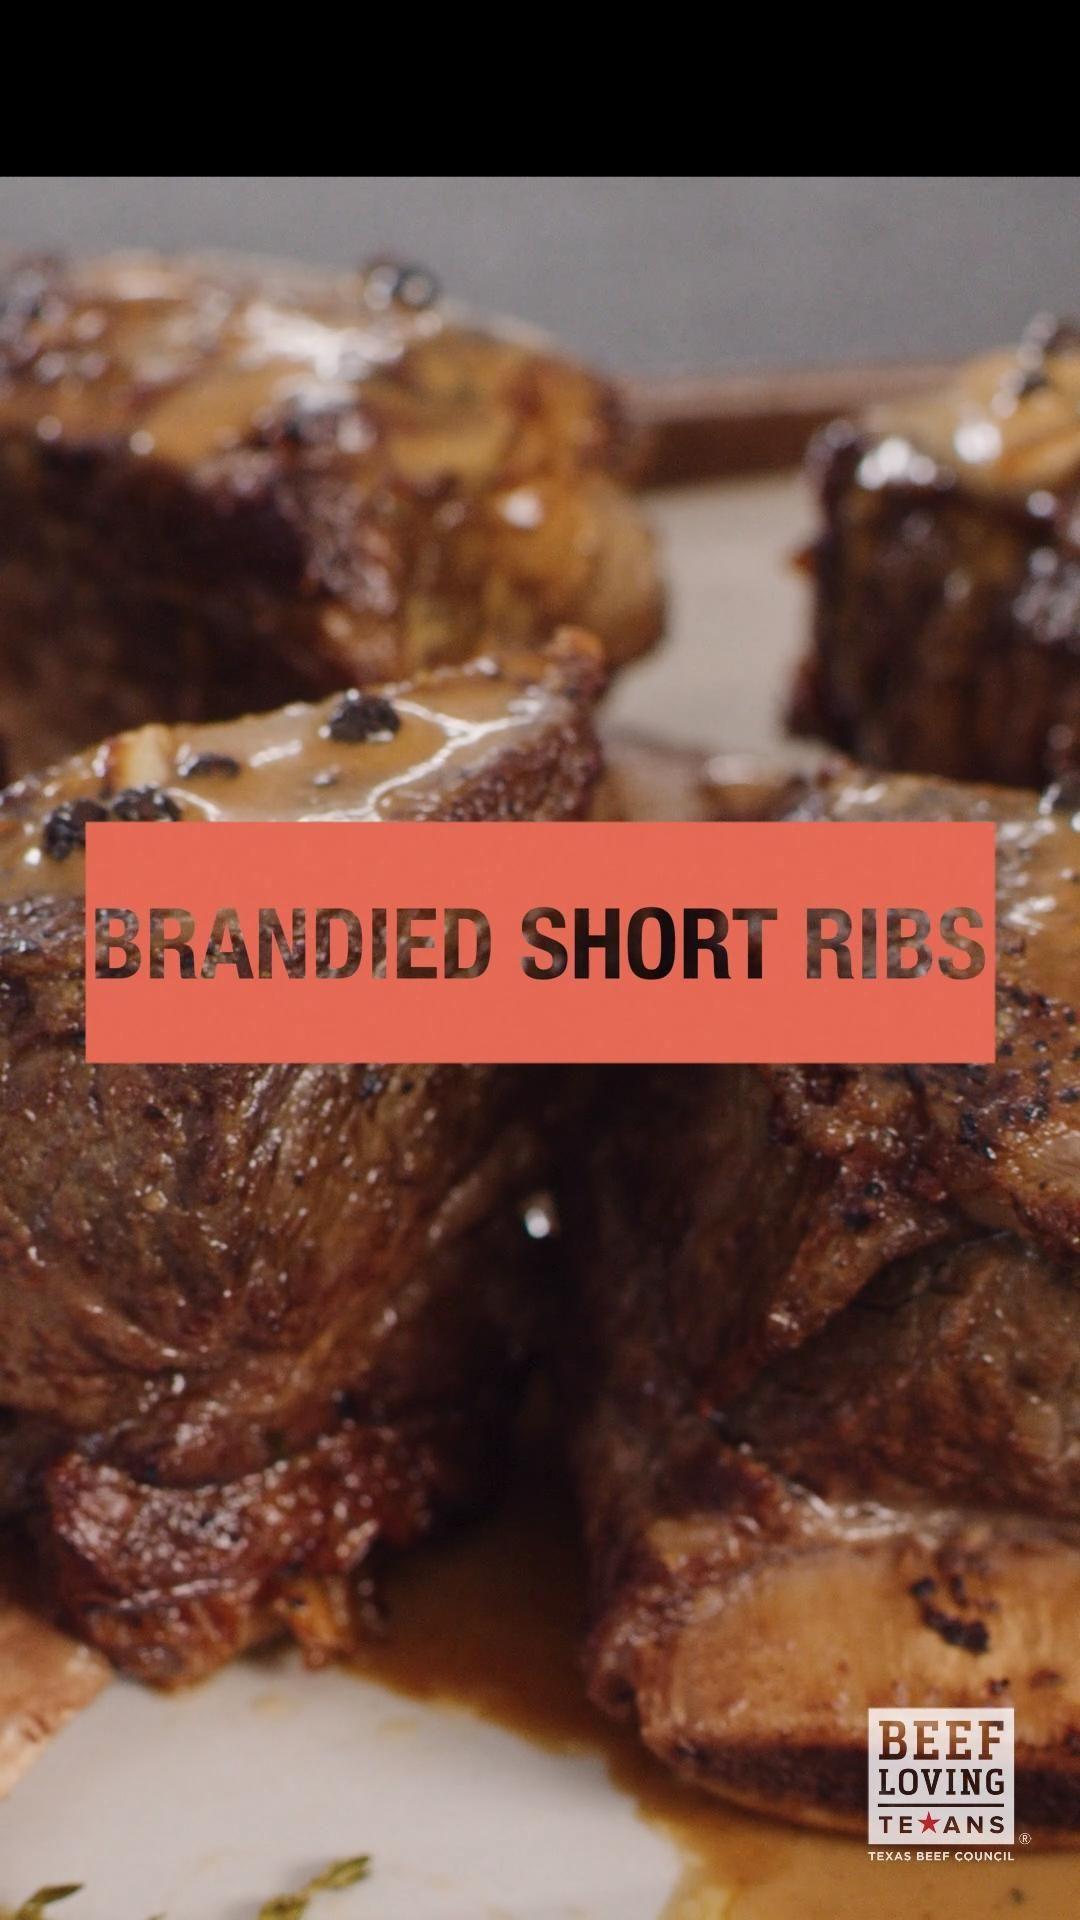 Chef Eddie Jackson S Brandied Short Ribs Video Recipe Video In 2021 Recipes Short Ribs Cooking Recipes